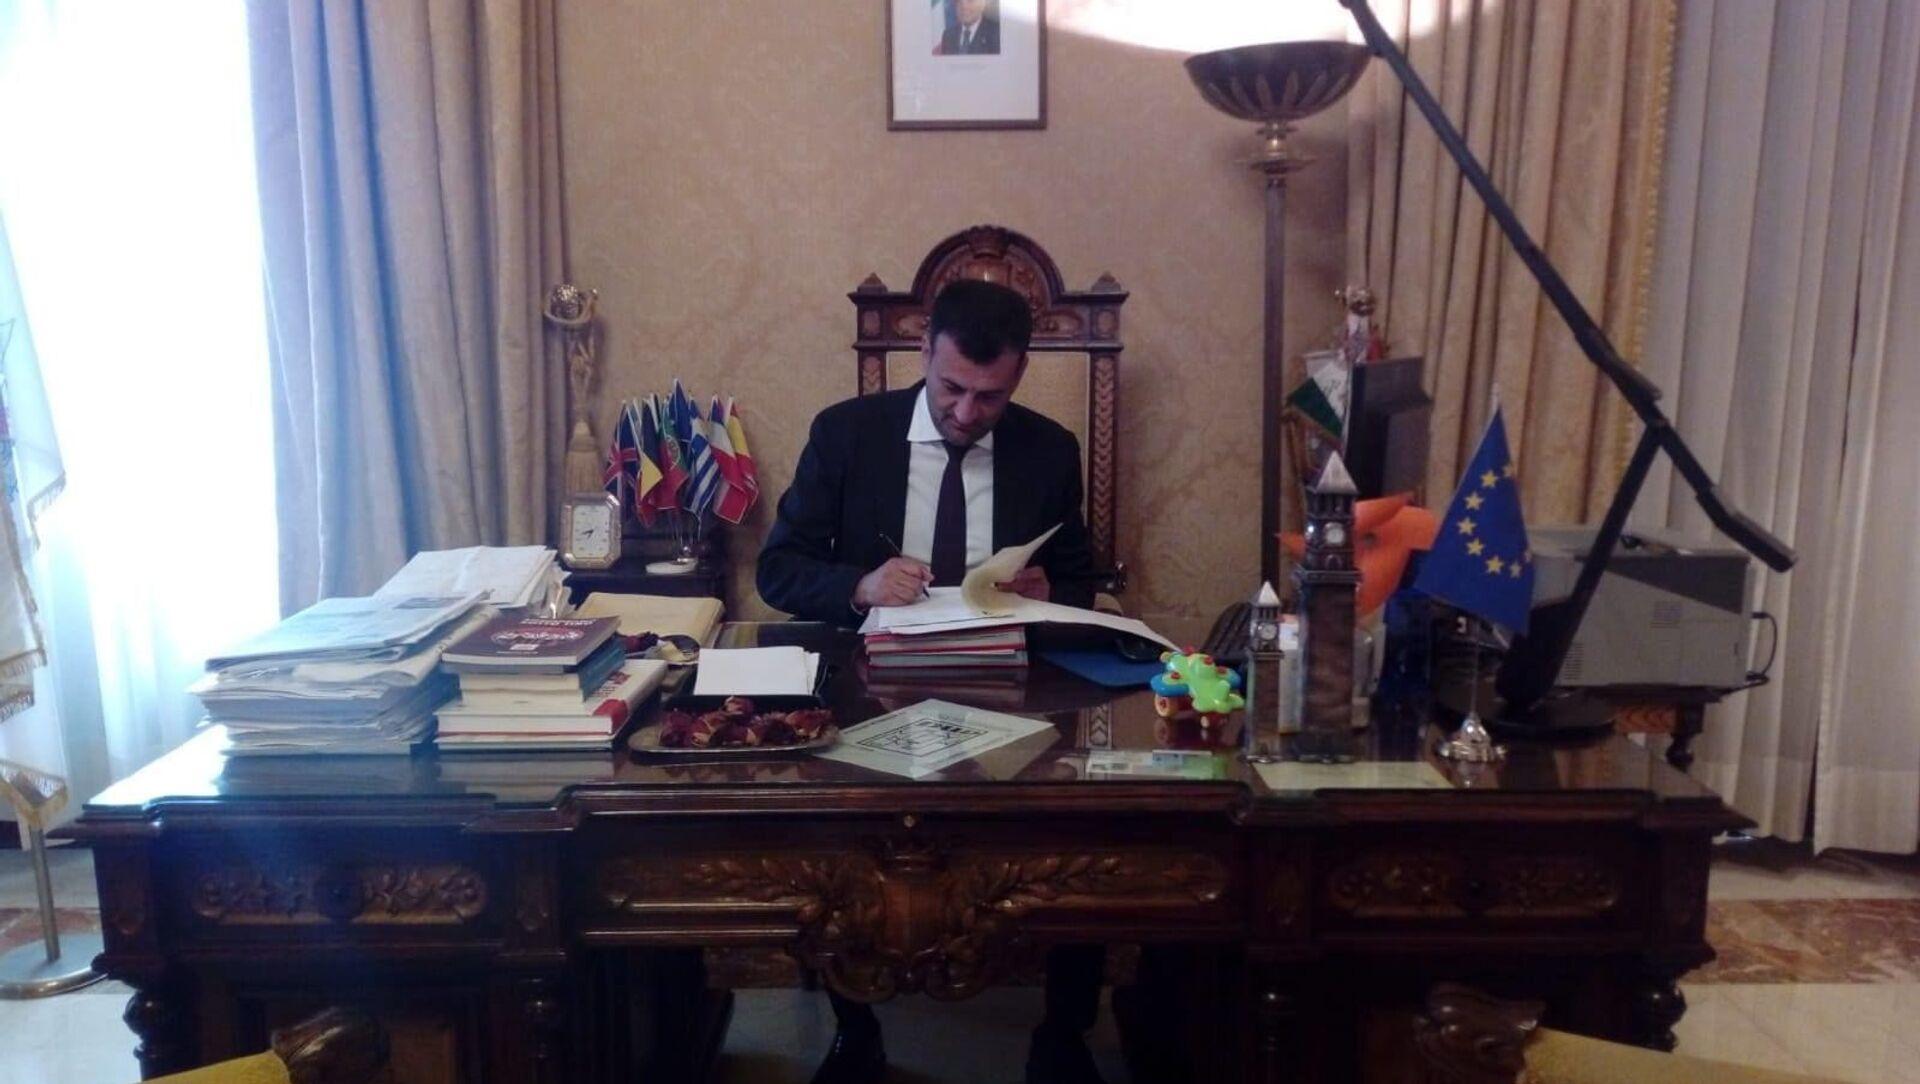 Antonio Decaro, sindaco di Bari - Sputnik Italia, 1920, 02.03.2021